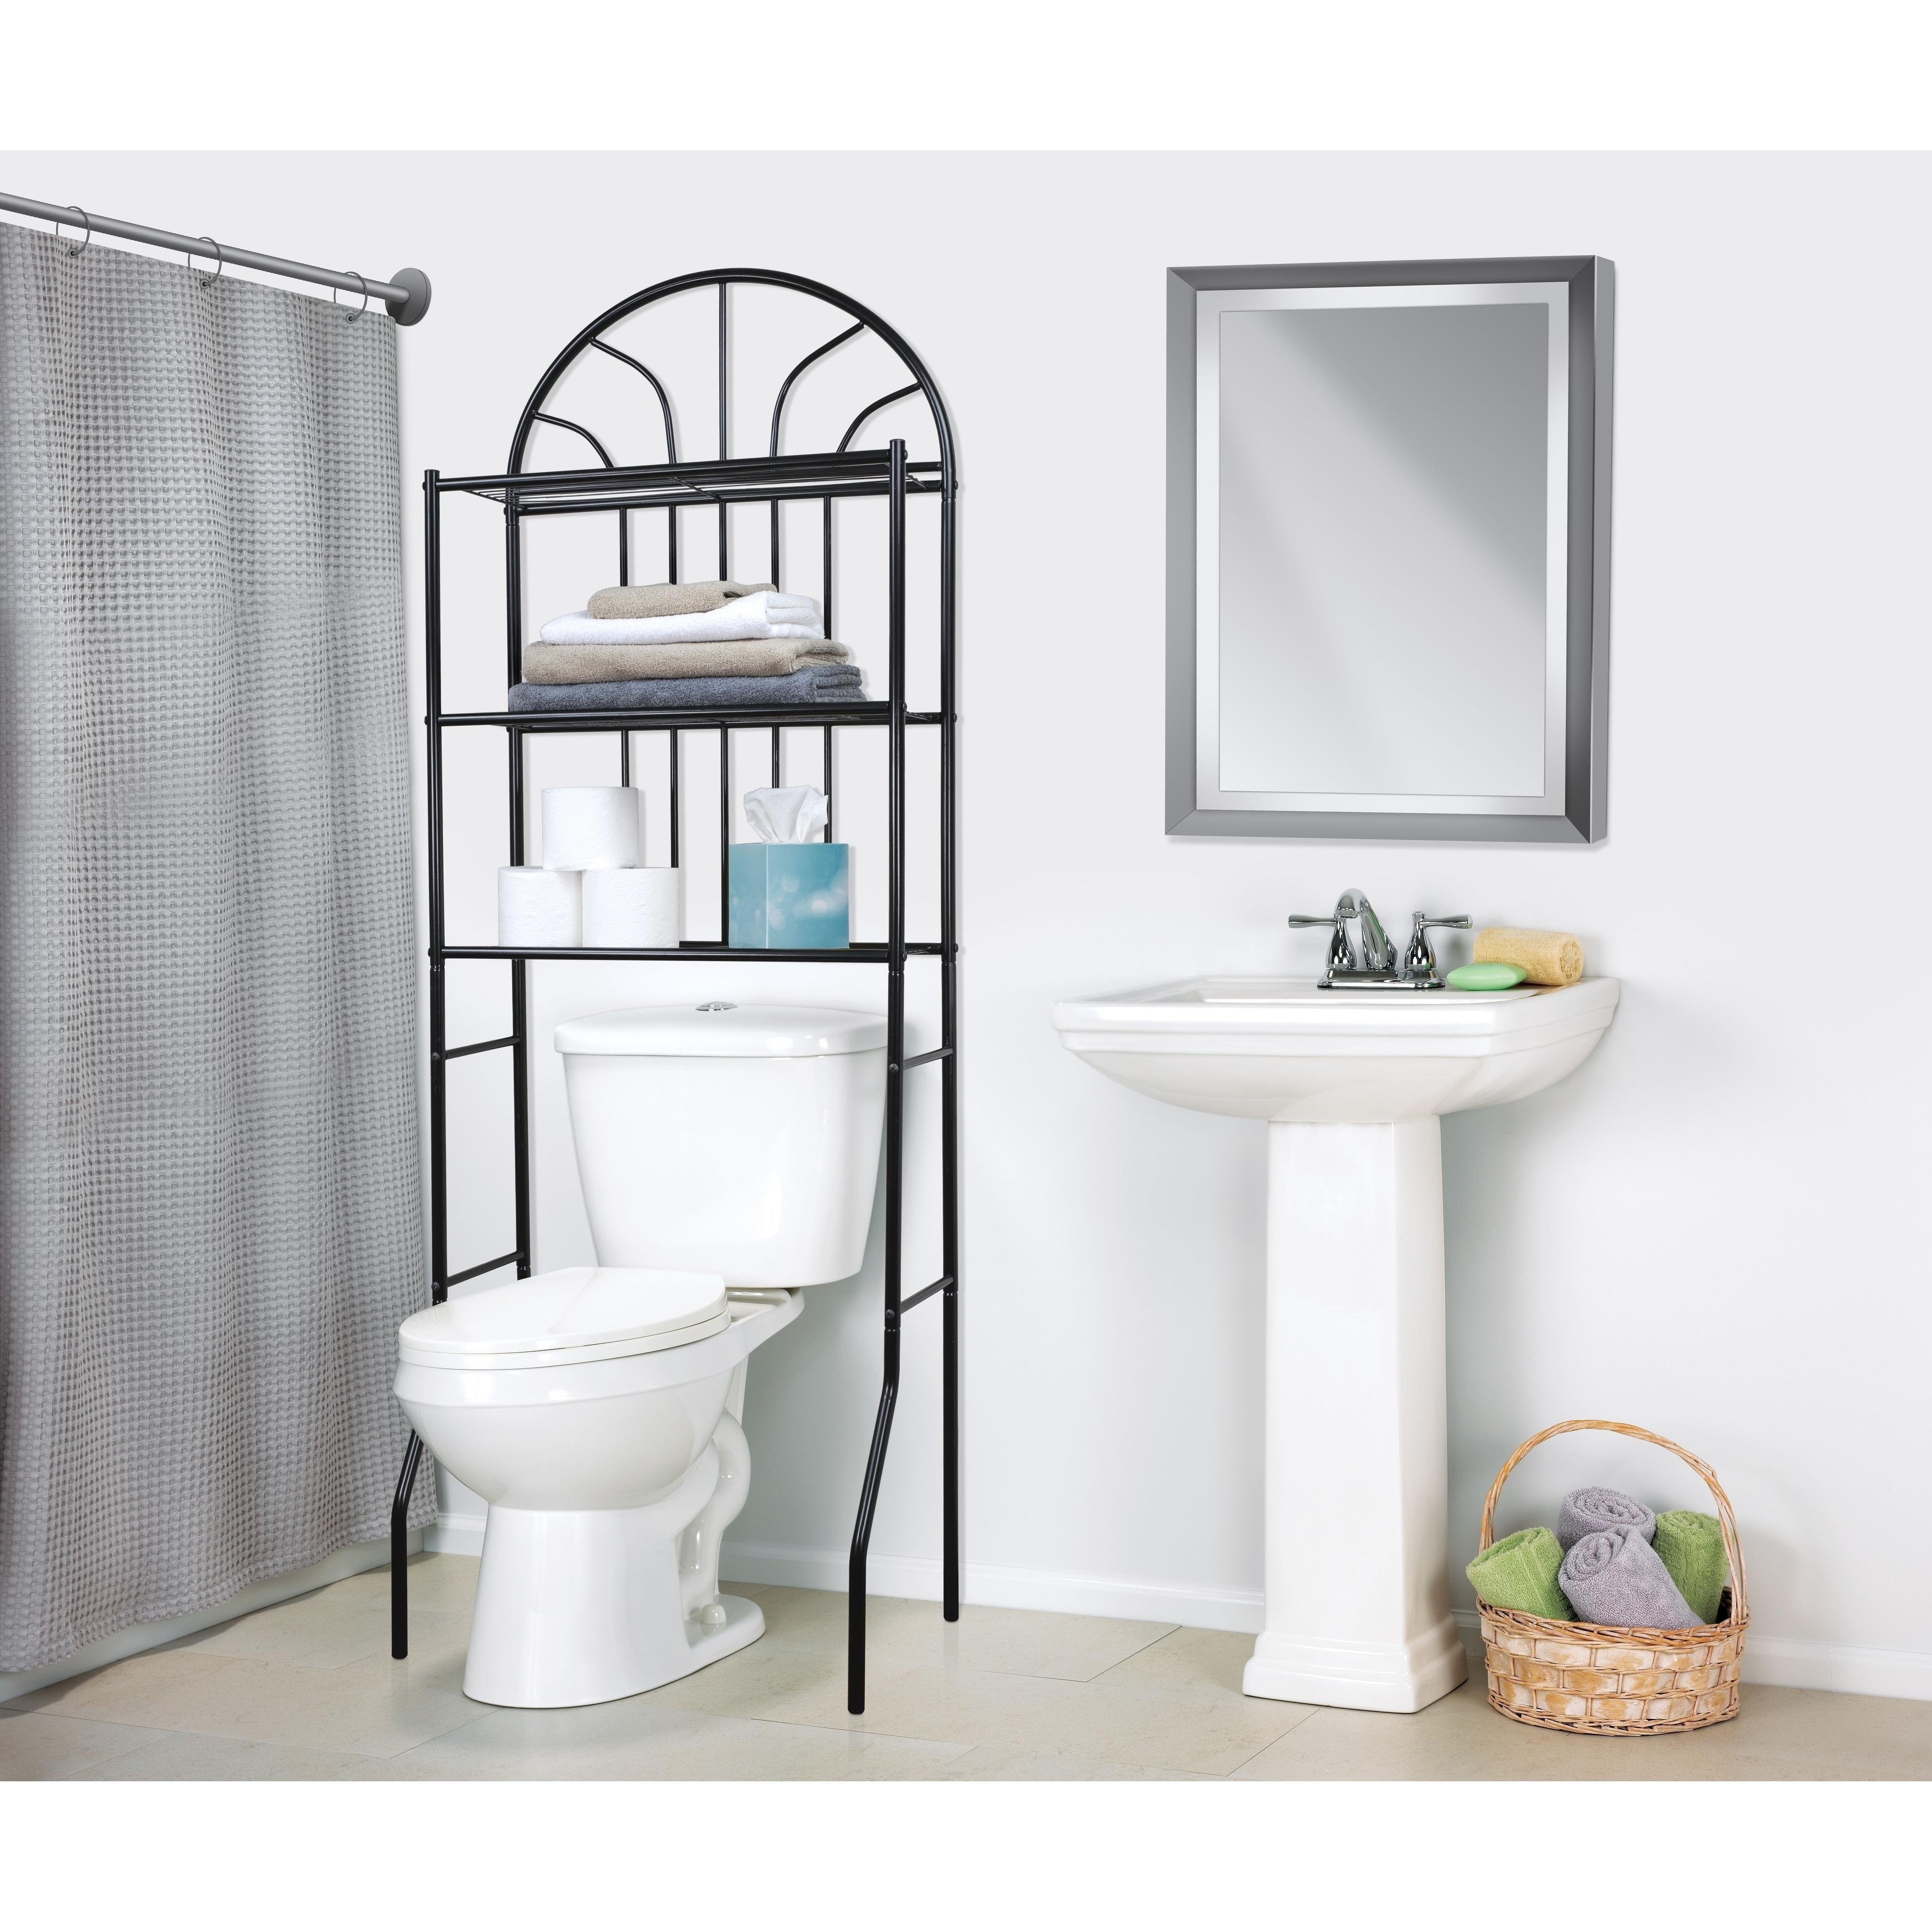 Shop Home Basics Black Steel 2-shelf Bathroom Space Saver - Free Shipping Today - Overstock.com - 10411332